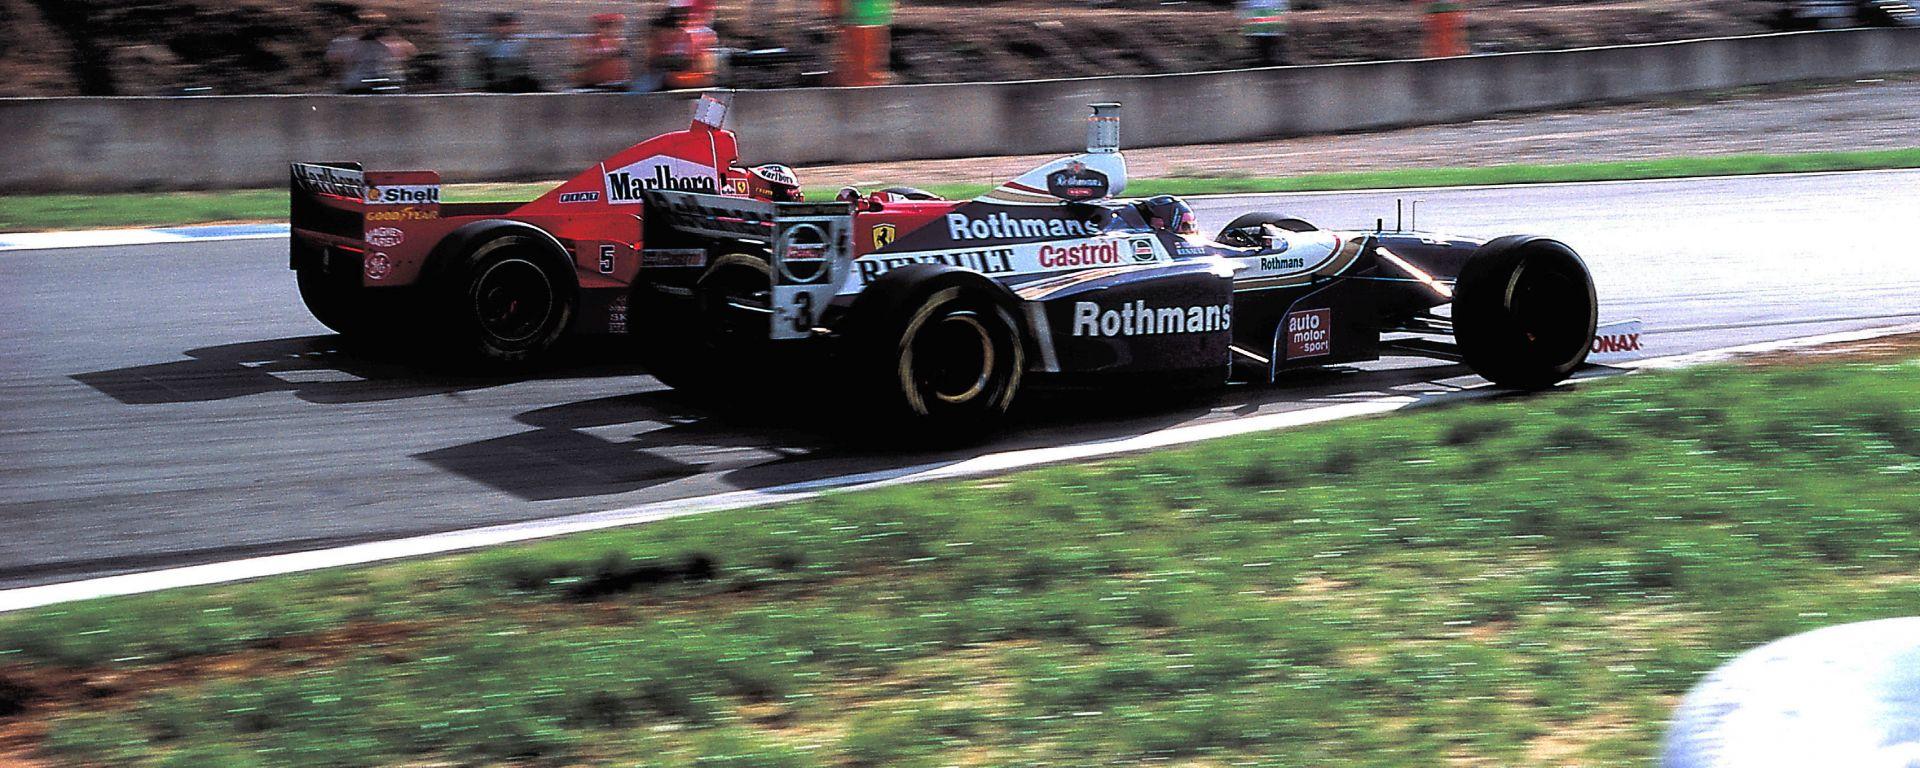 F1 GP Europa 1997, Jerez de la Frontera: Michael Schumacher (Ferrari) e Jacques Villeneuve (Williams)